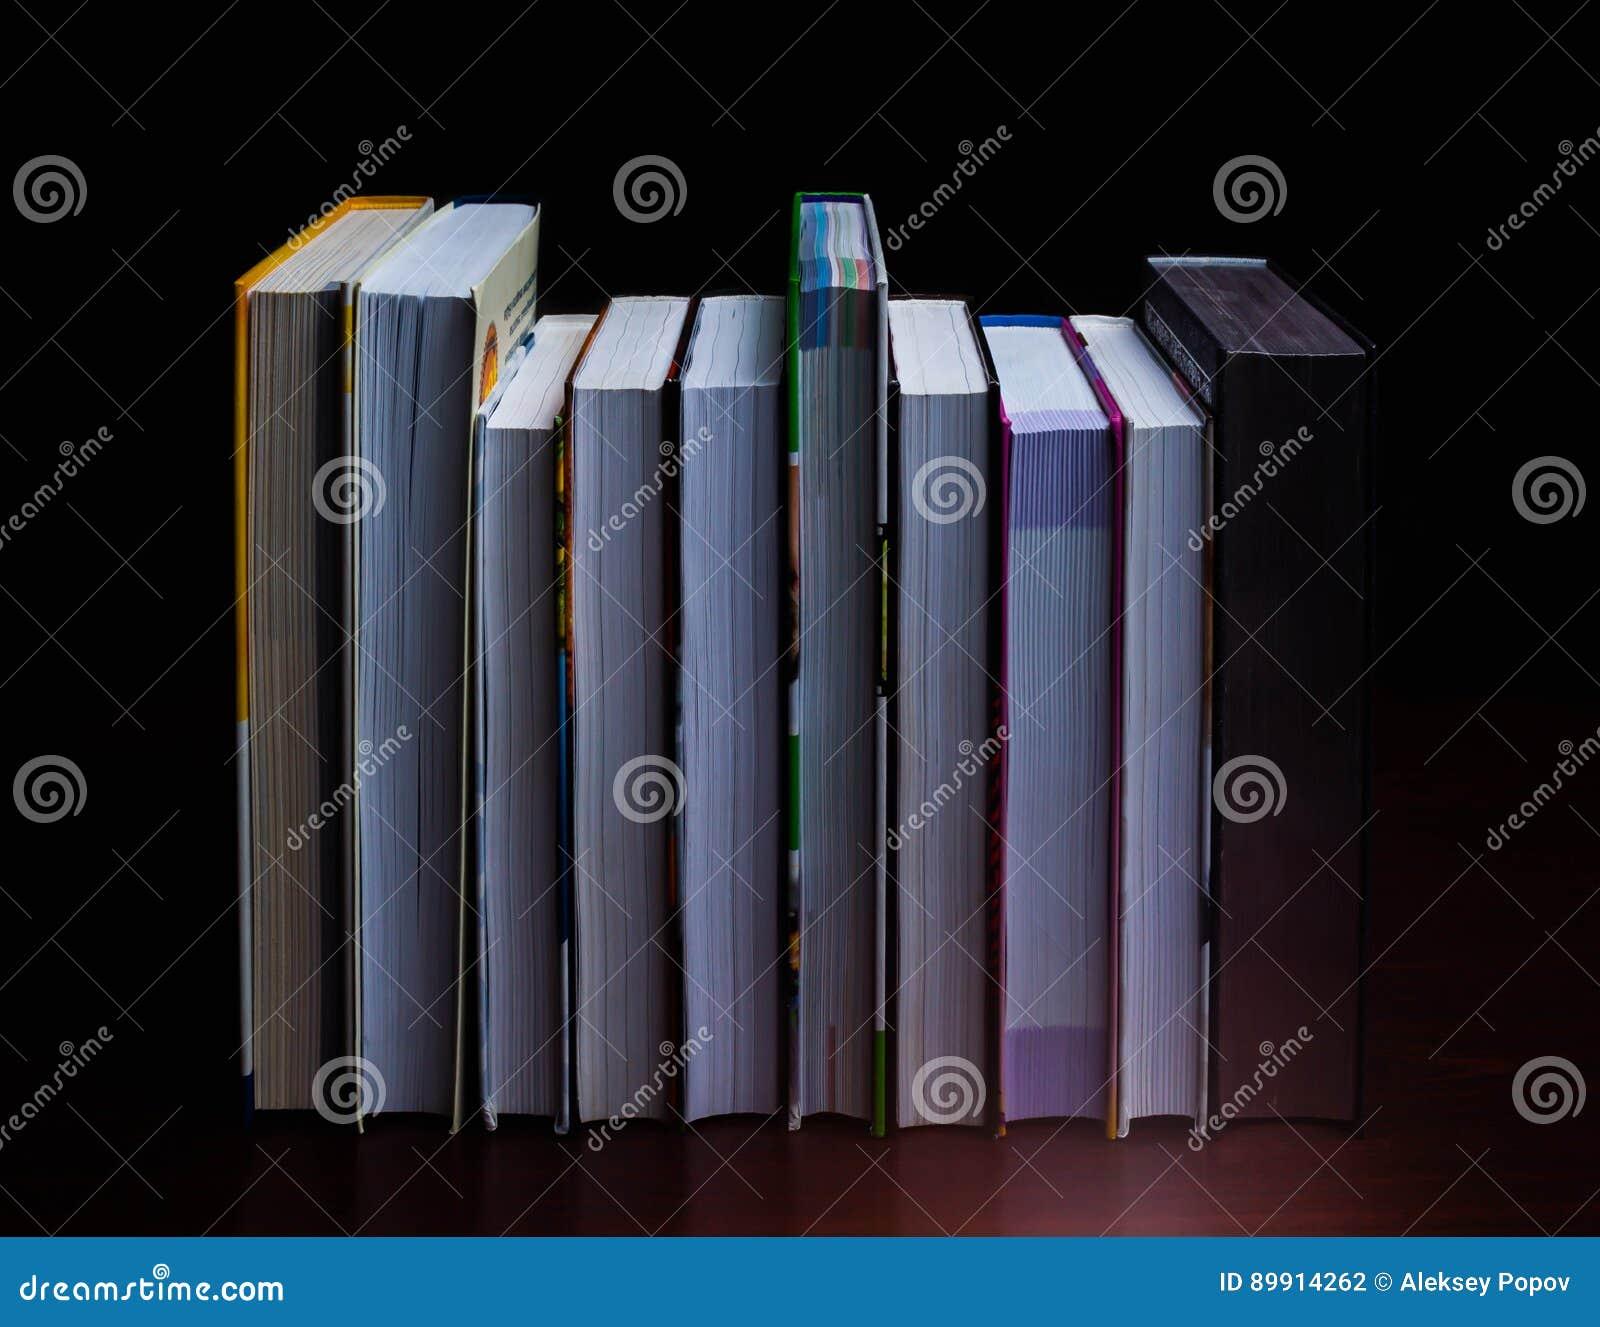 School Books On Desk, Education Concept, Educate, Technology